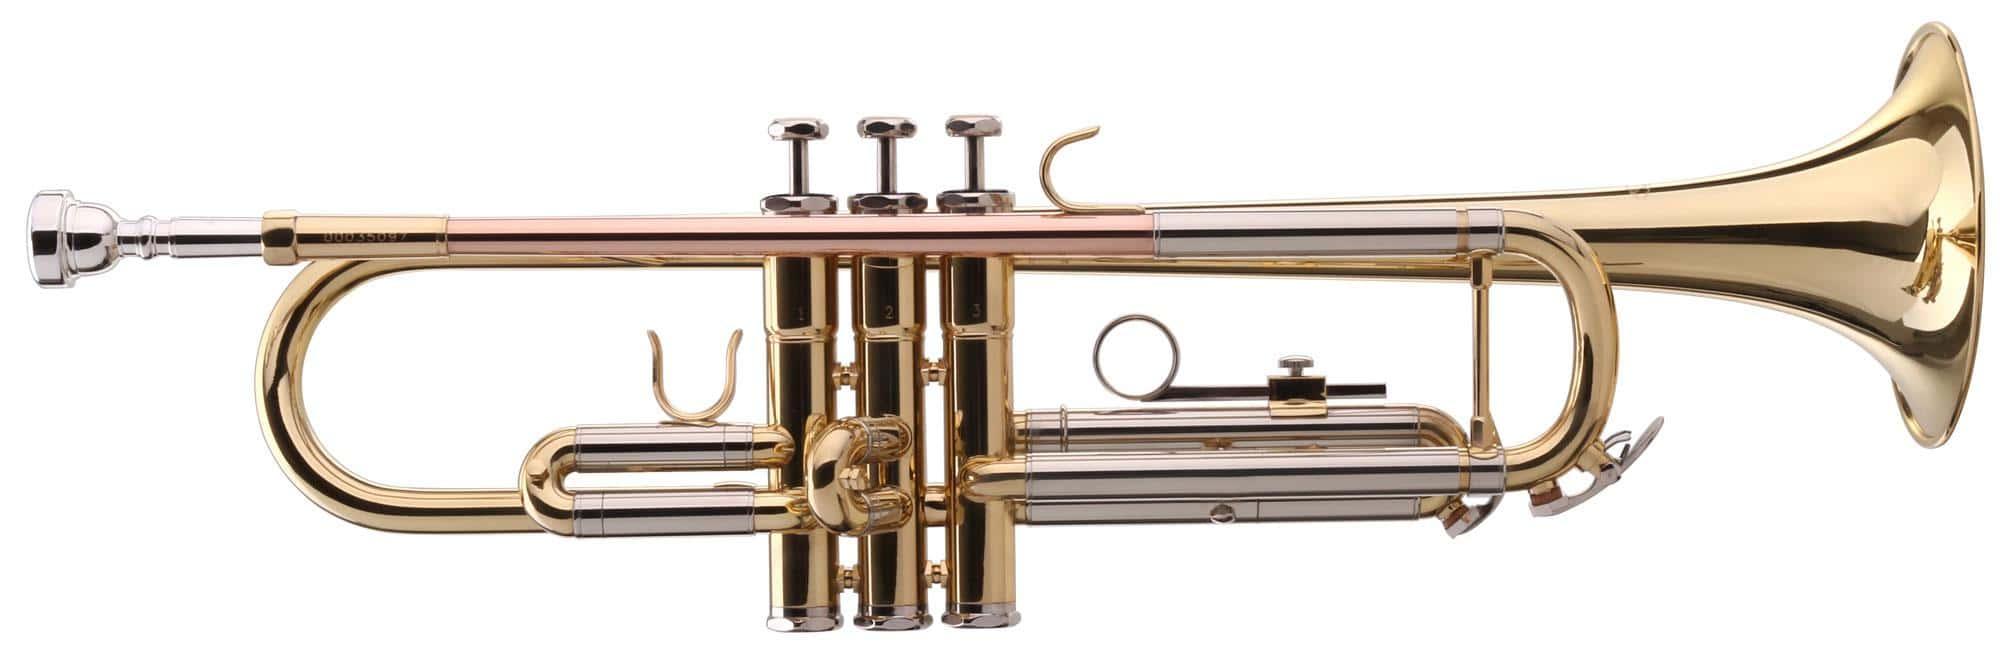 Trompeten - Classic Cantabile TR 40L Bb Trompete - Onlineshop Musikhaus Kirstein